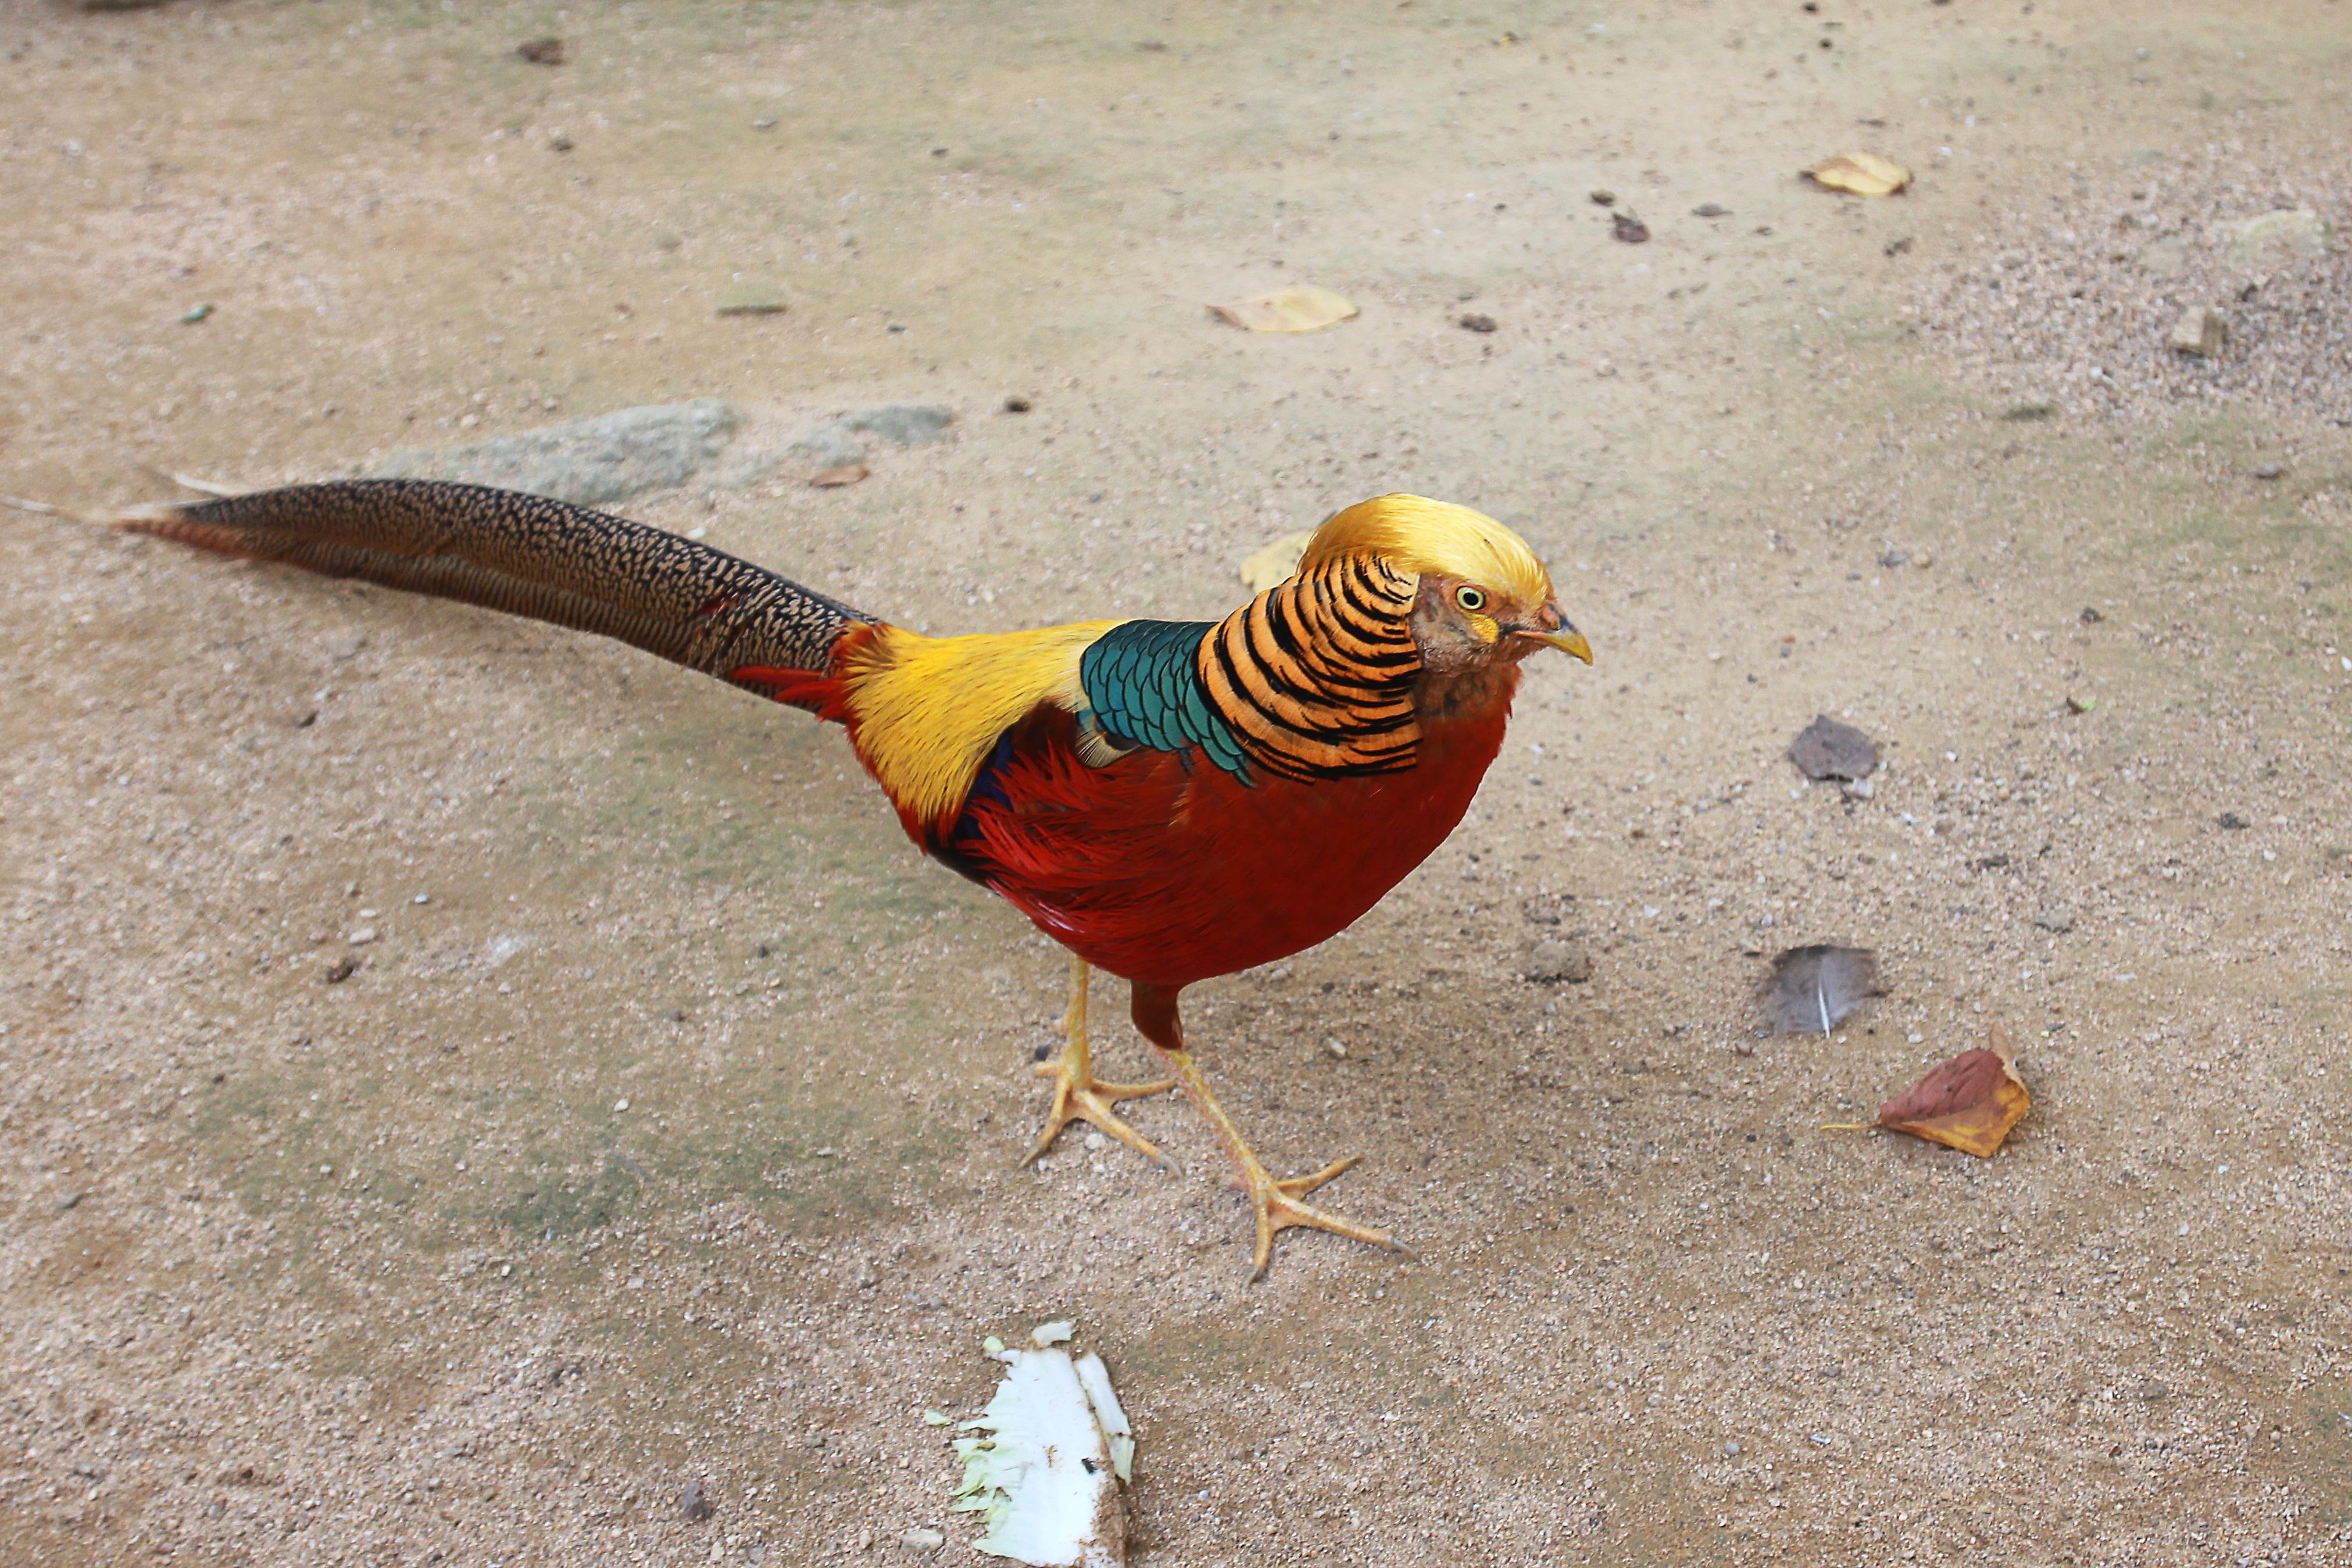 Red golden pheasant